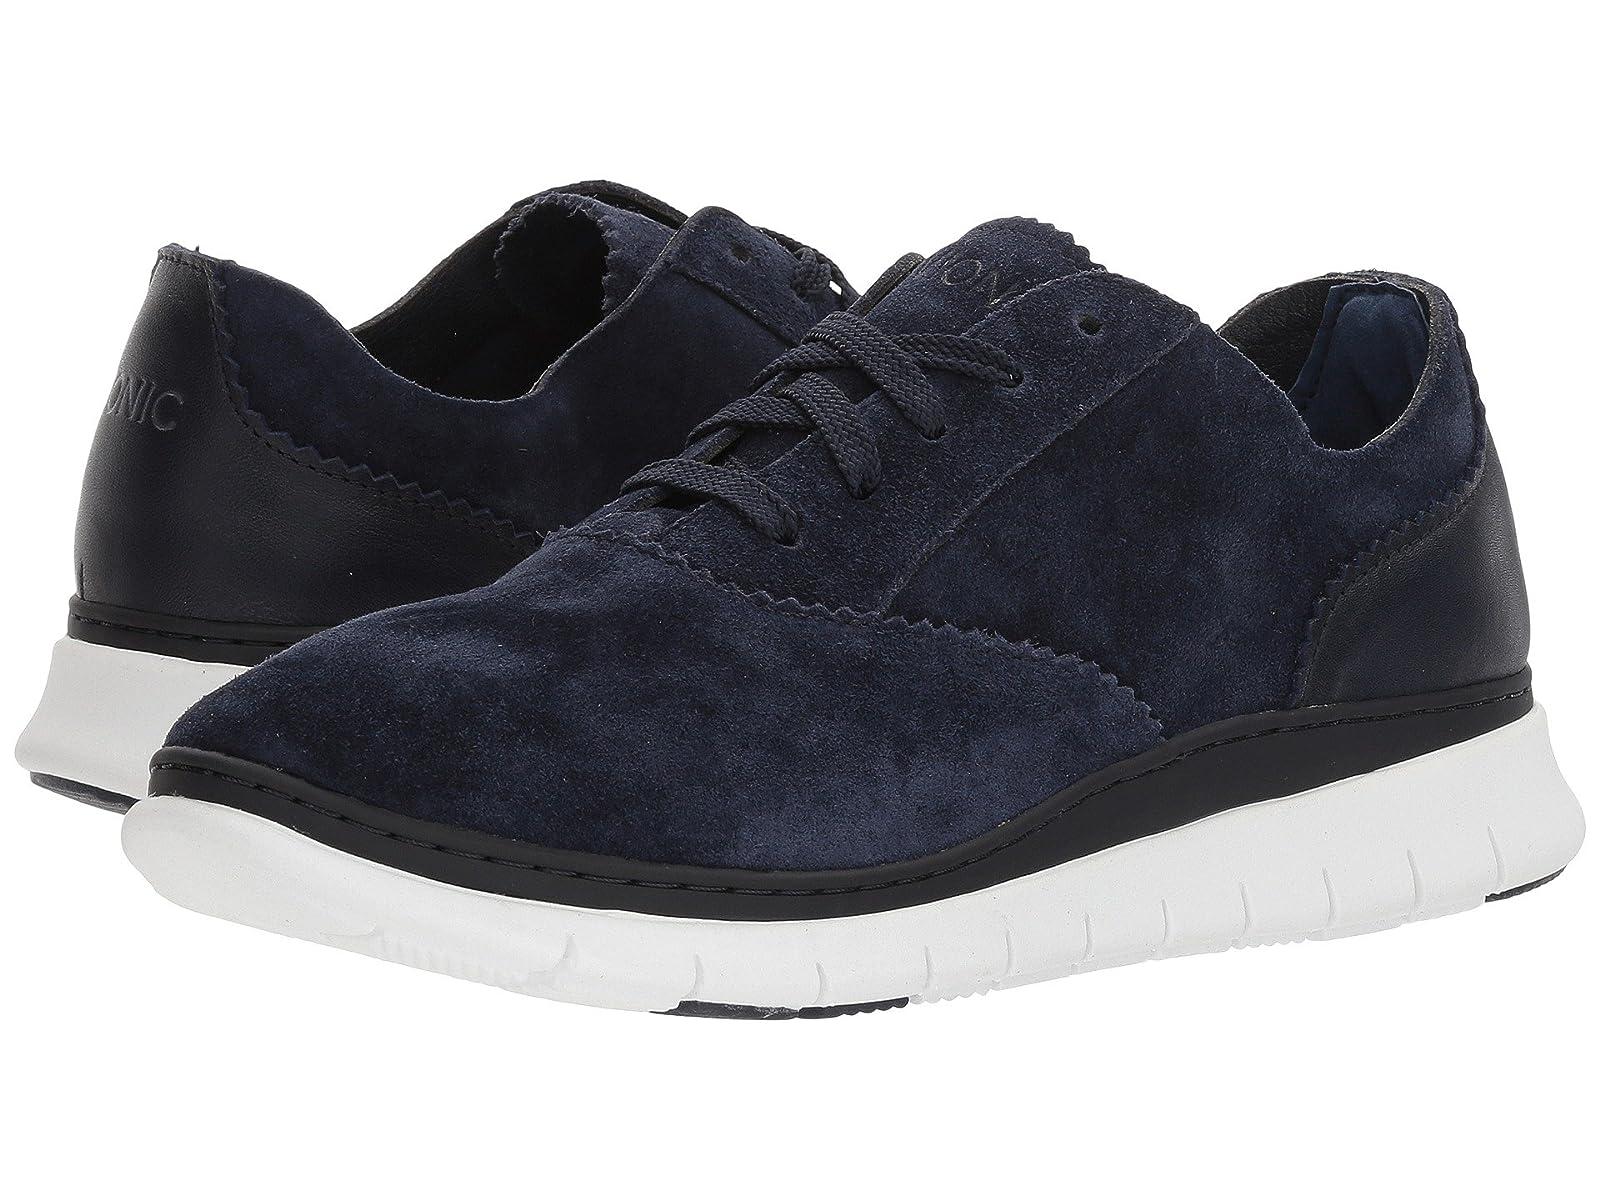 VIONIC TaylorCheap and distinctive eye-catching shoes